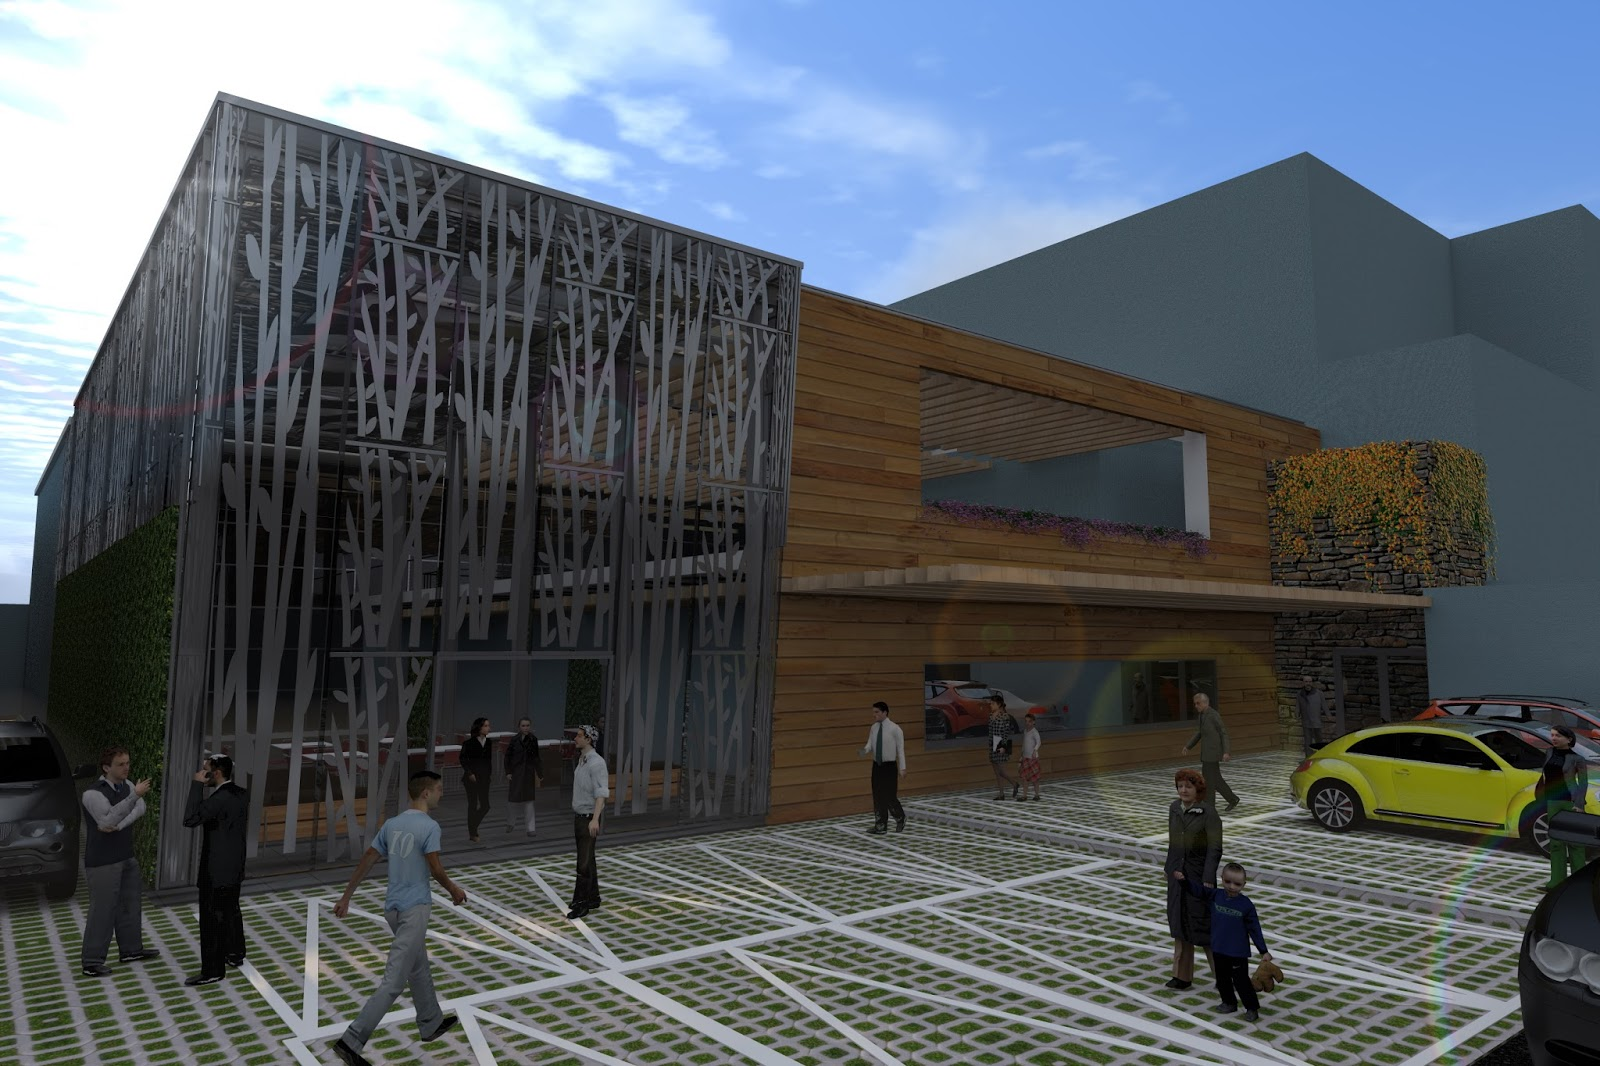 Arquitectura y dise o plaza lomas verdes for Diseno de muros verdes